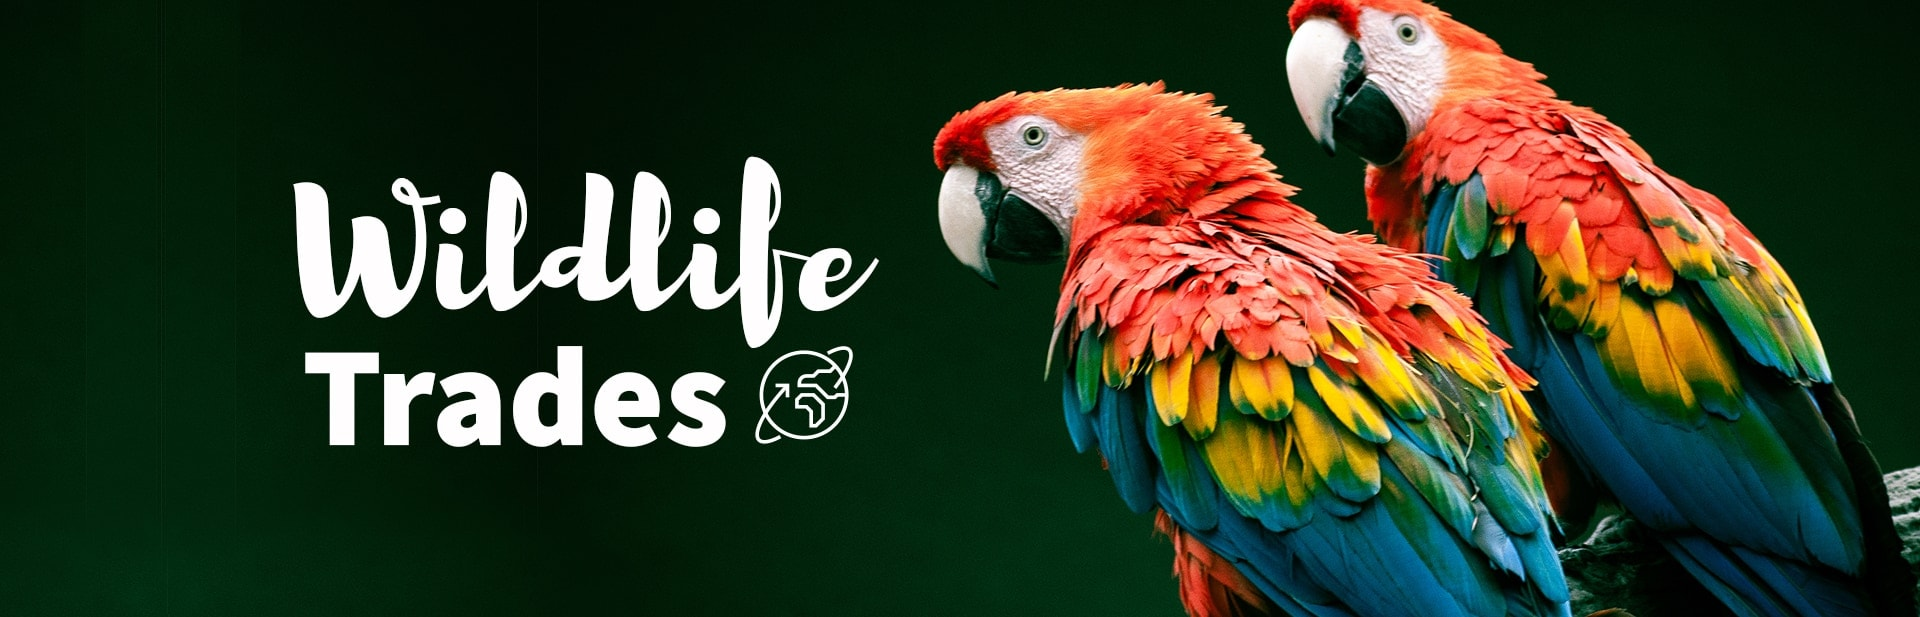 Wildlife Trades